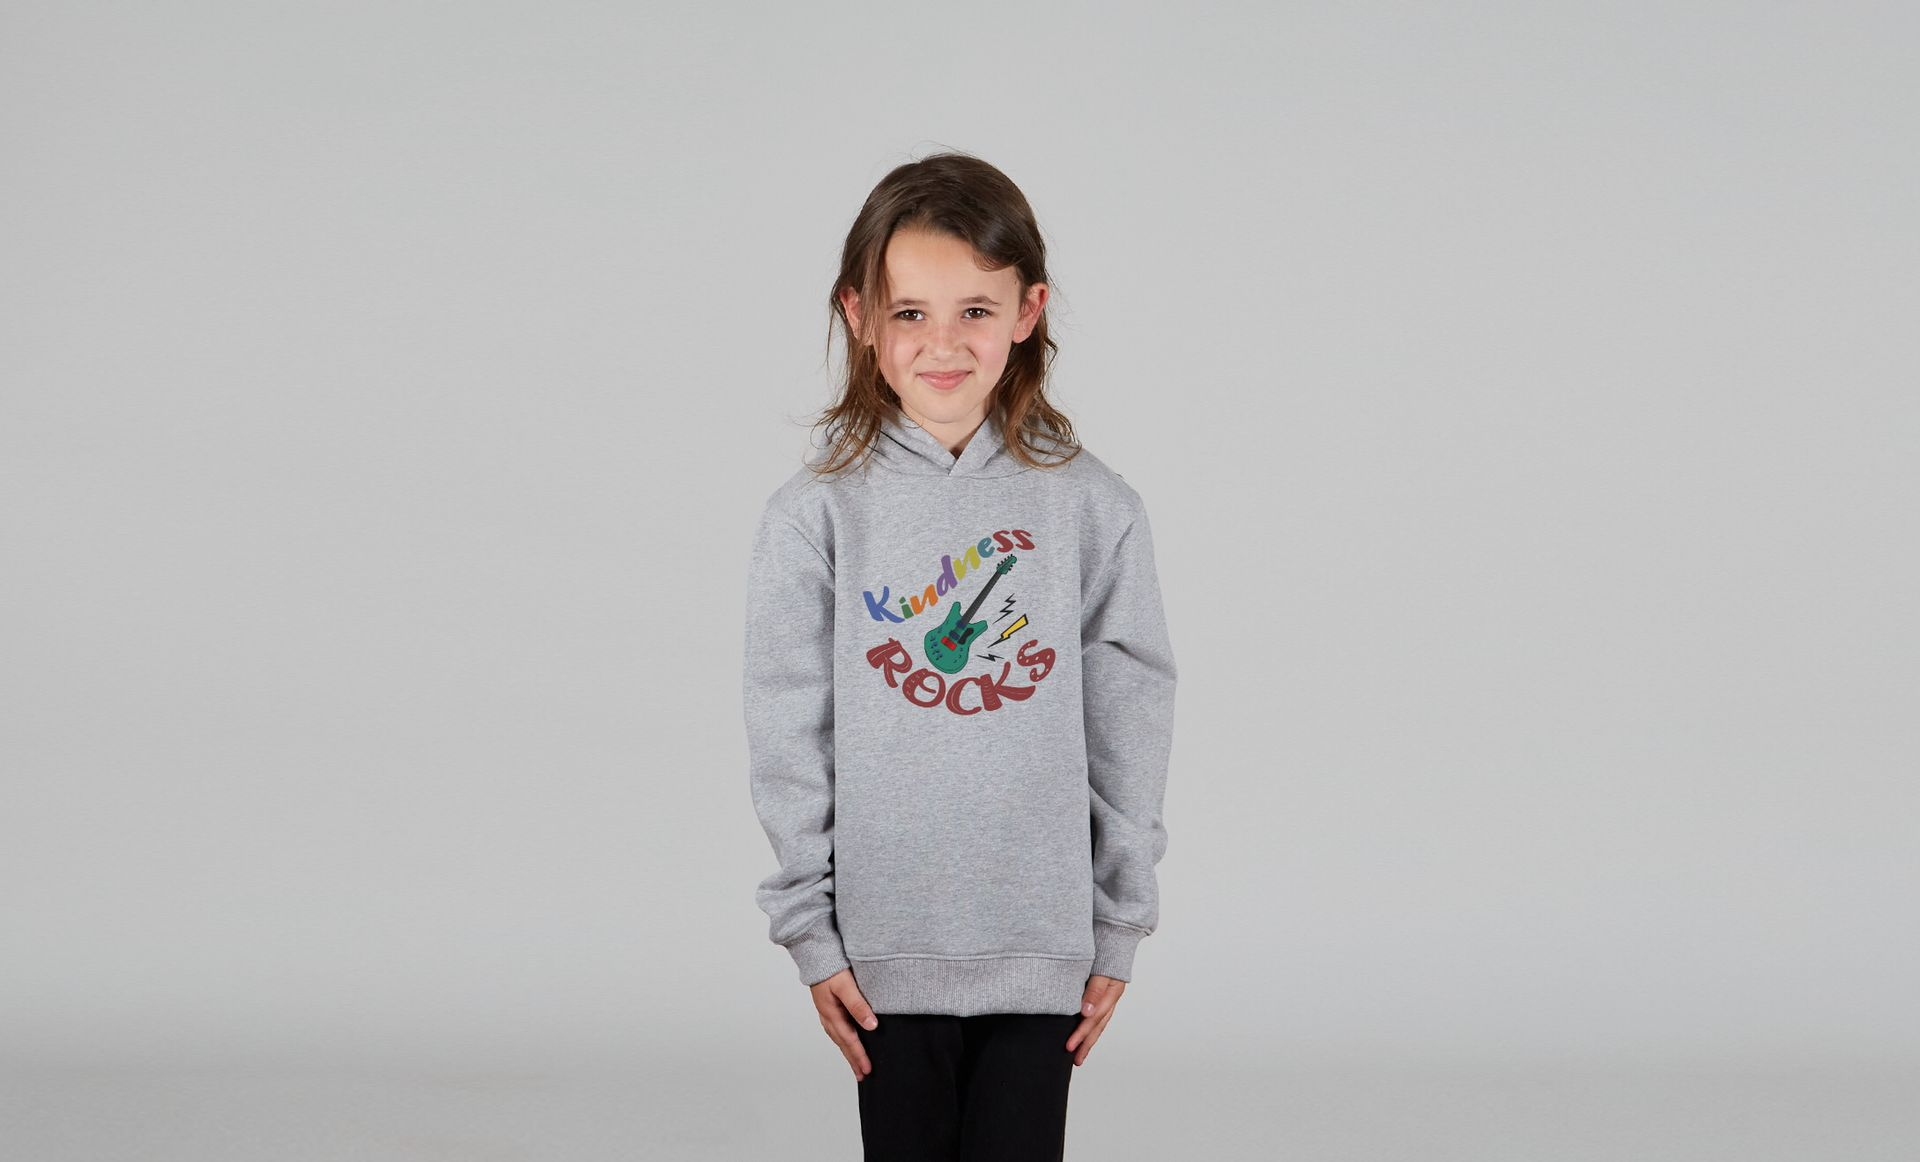 Kindness ROCKS Kids Pullover Hoodie Light Heather Grey Girl Model